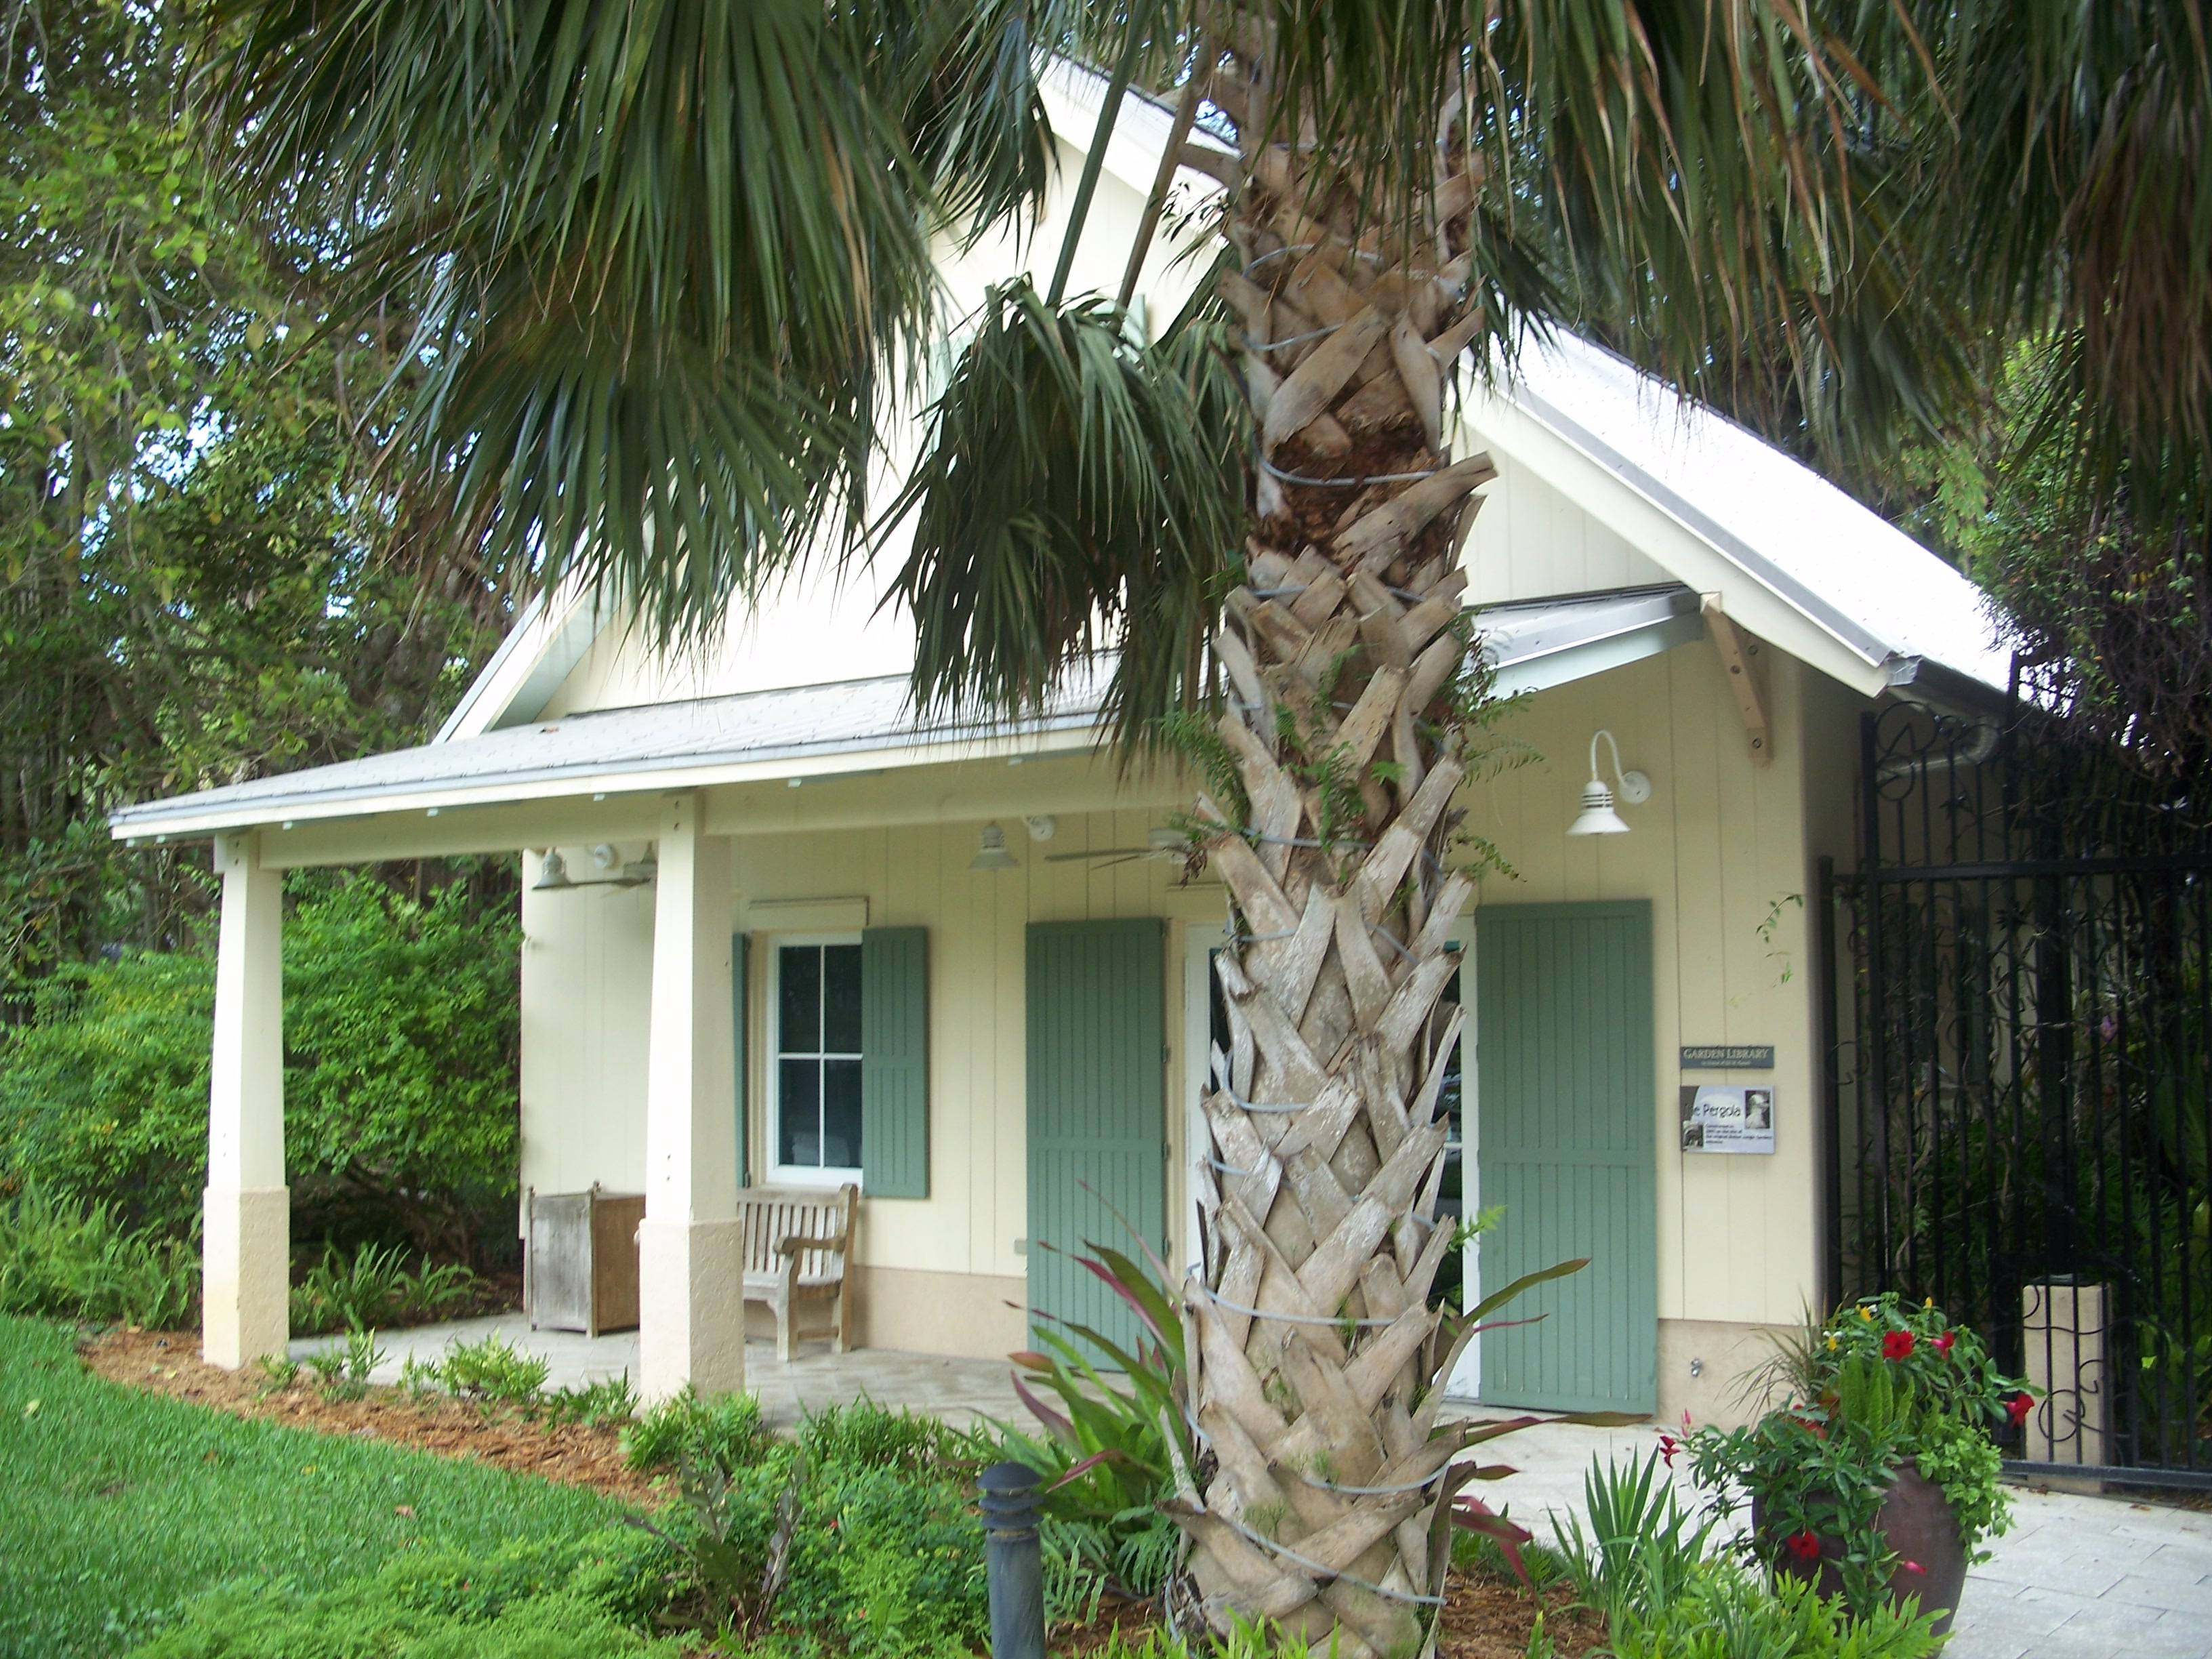 File:Vero Beach FL McKee Gardens03.jpg - Wikimedia Commons